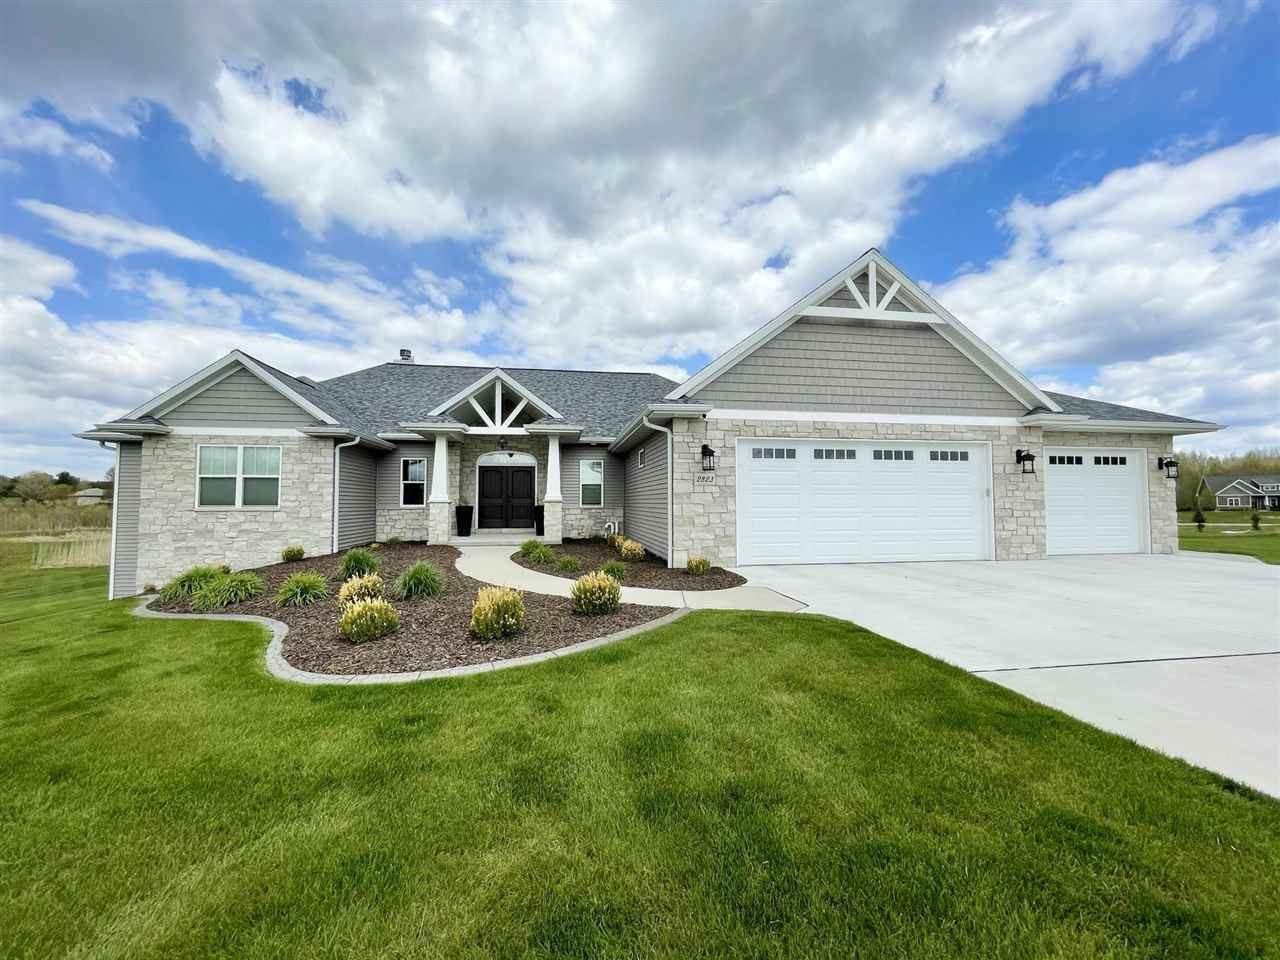 2823 STONE CREEK Circle, Green Bay, WI 54313 - MLS#: 50239798